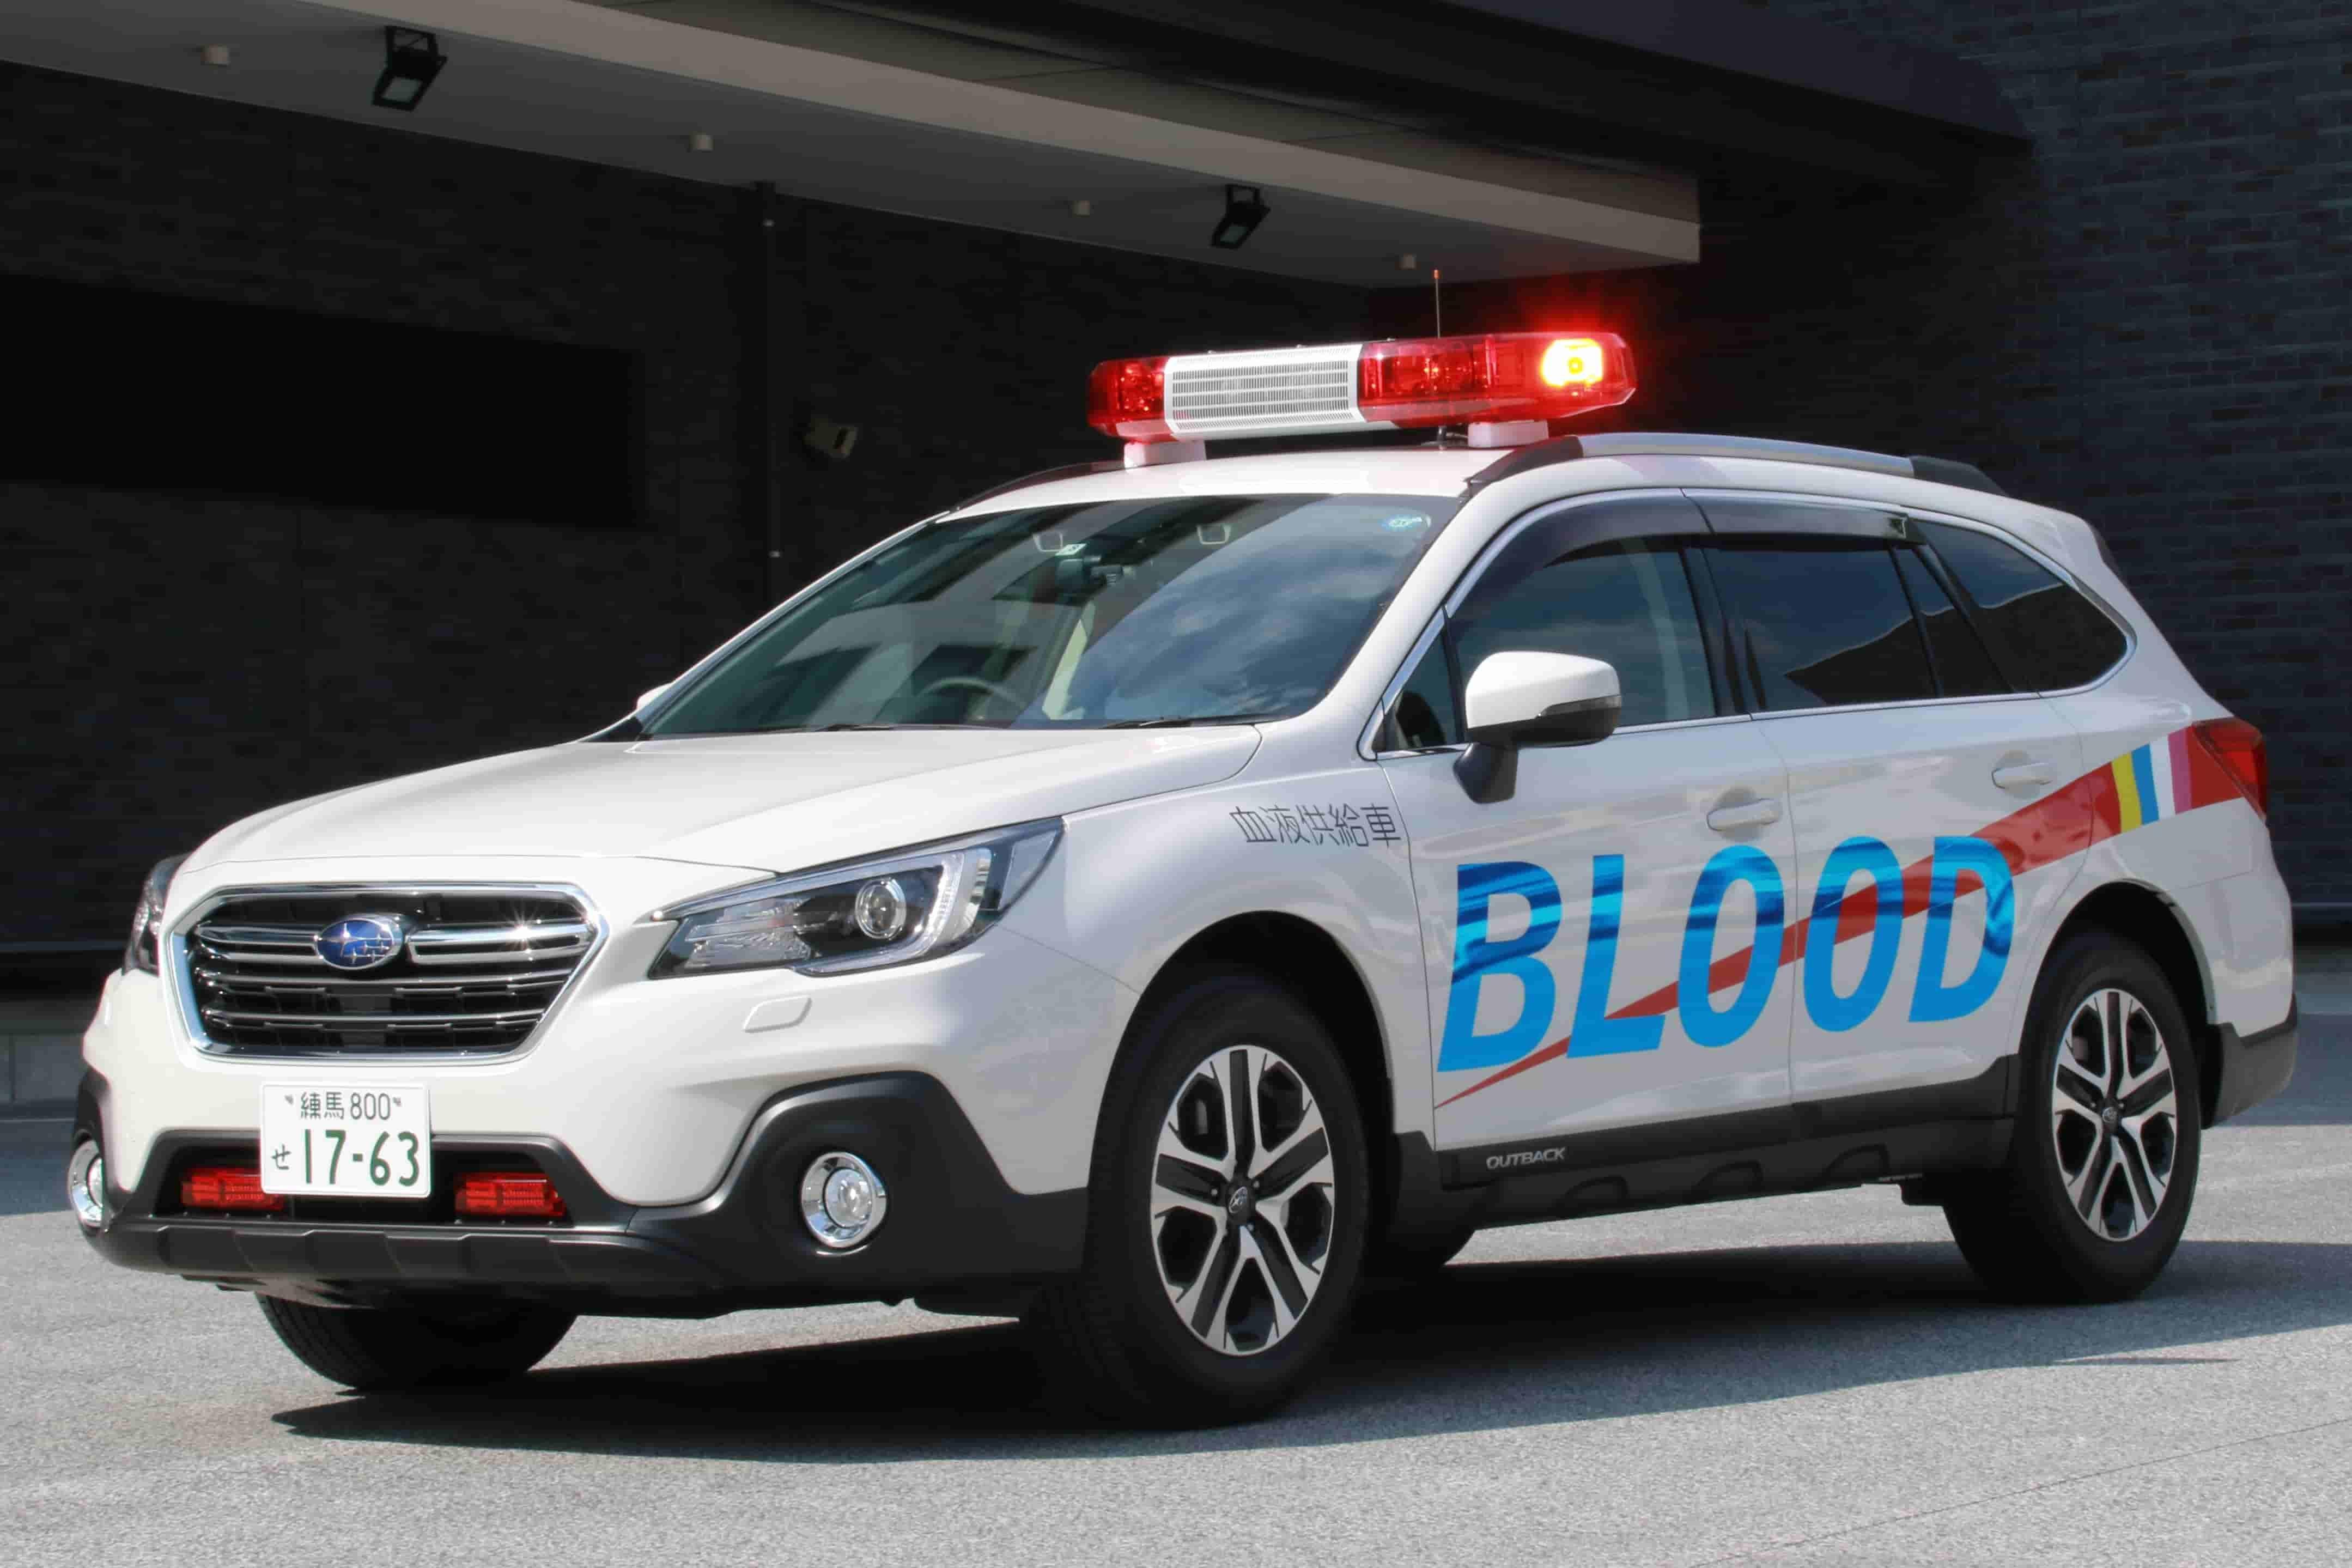 blog_blood_car.JPG